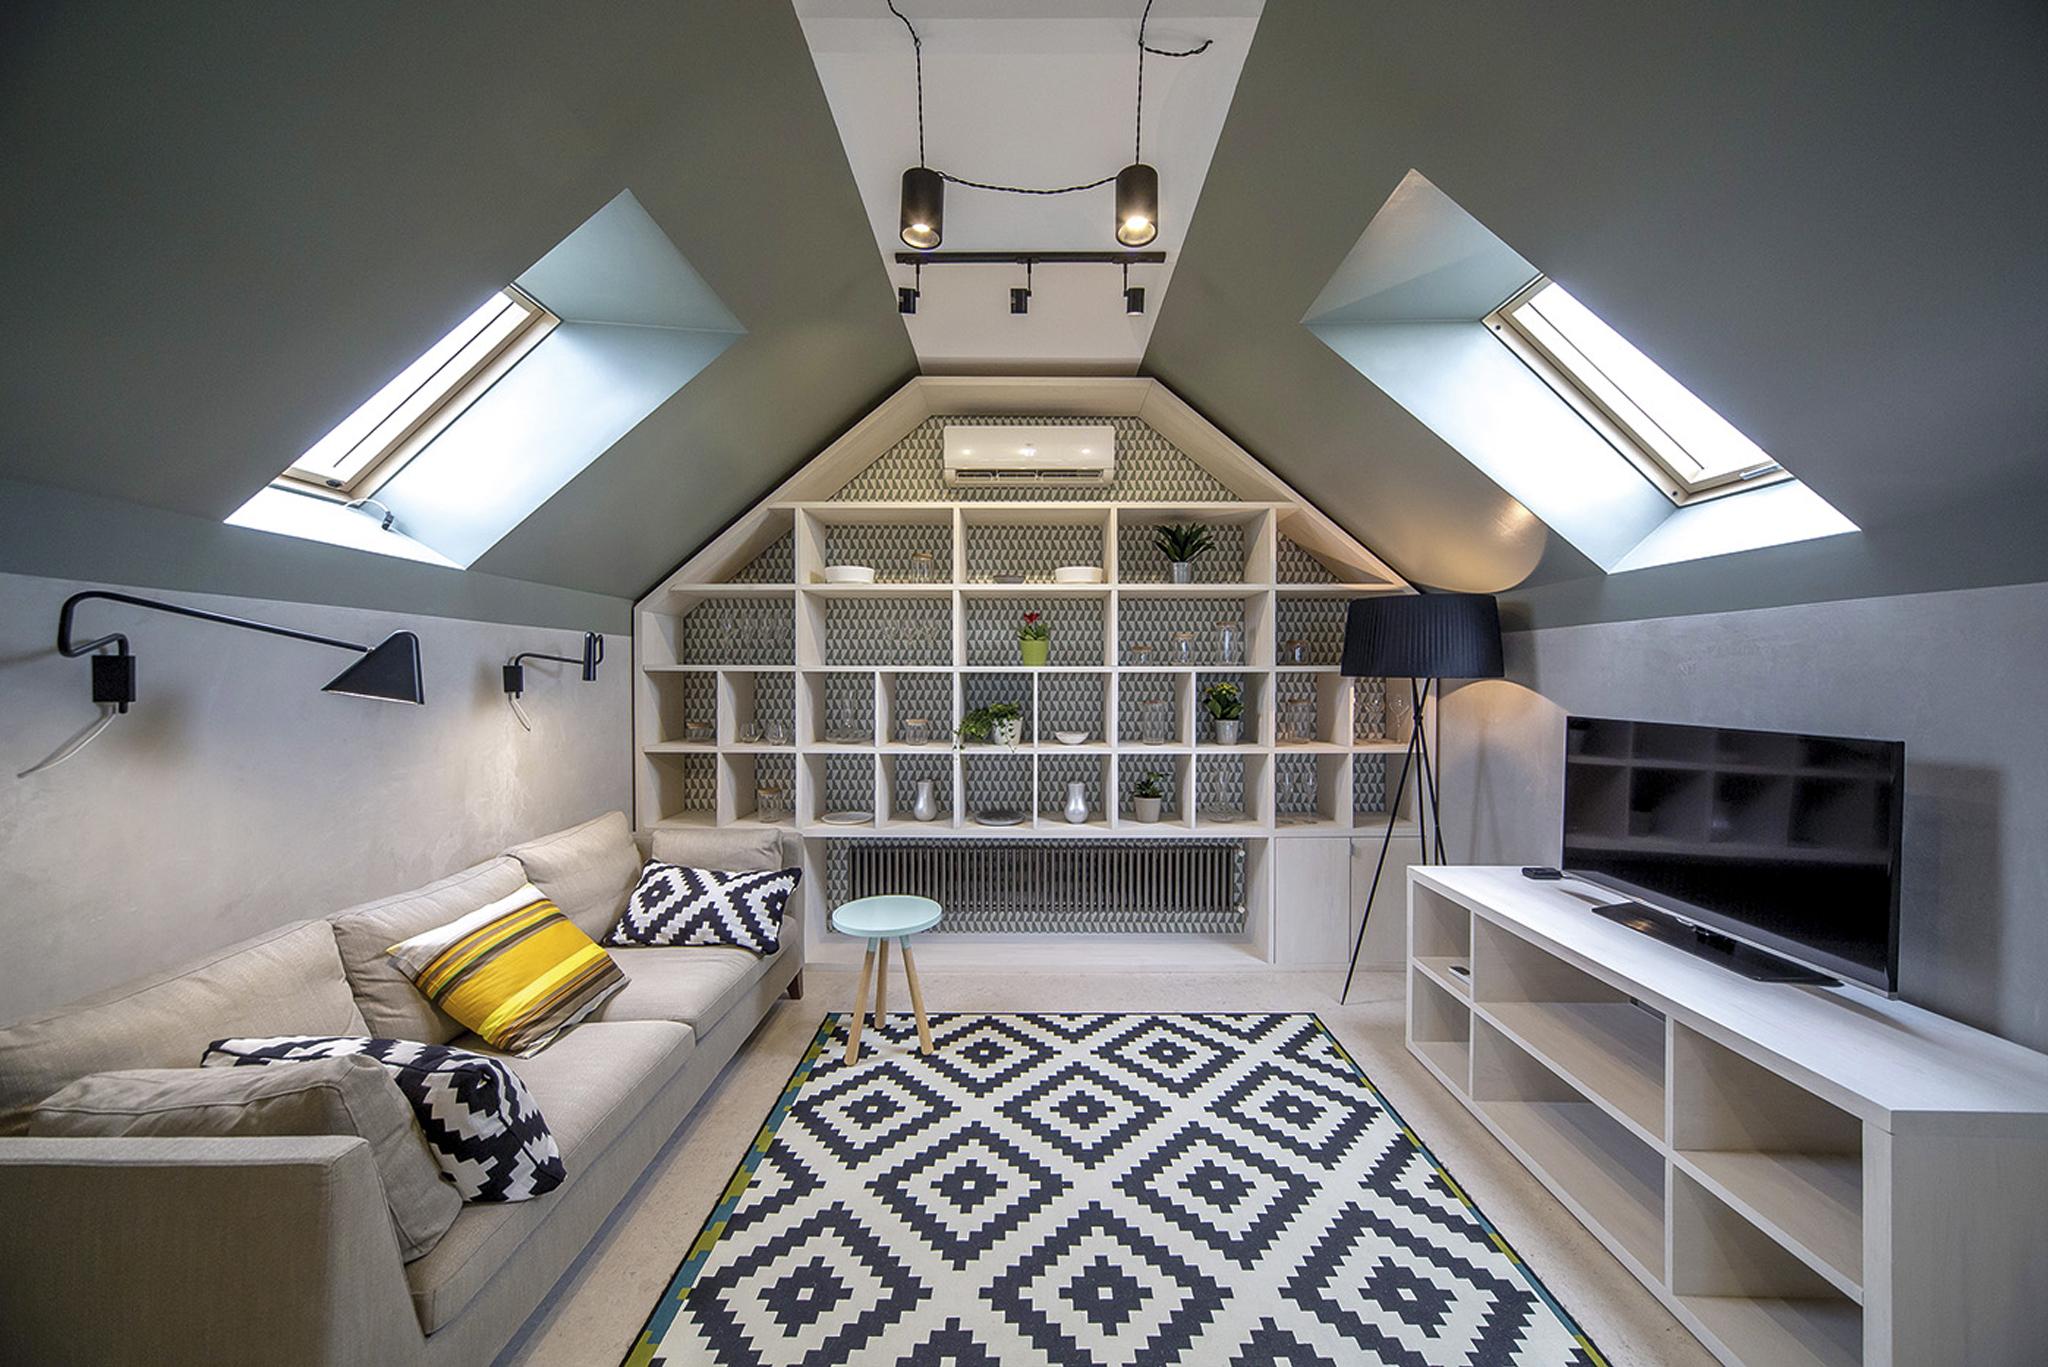 Centre pivot roof windows in loft conversion